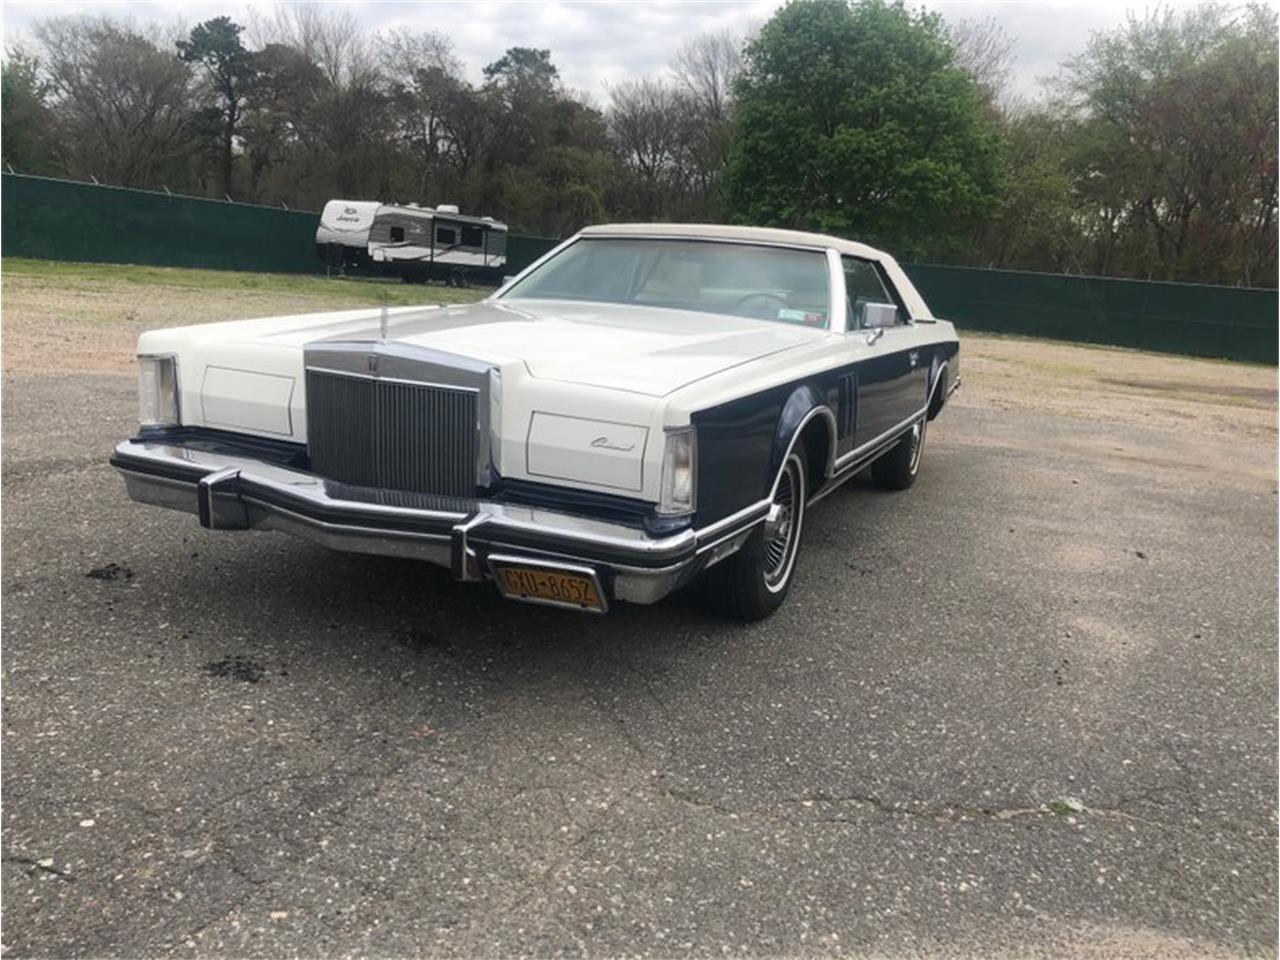 1979 Lincoln Mark V (CC-1215555) for sale in West Babylon, New York